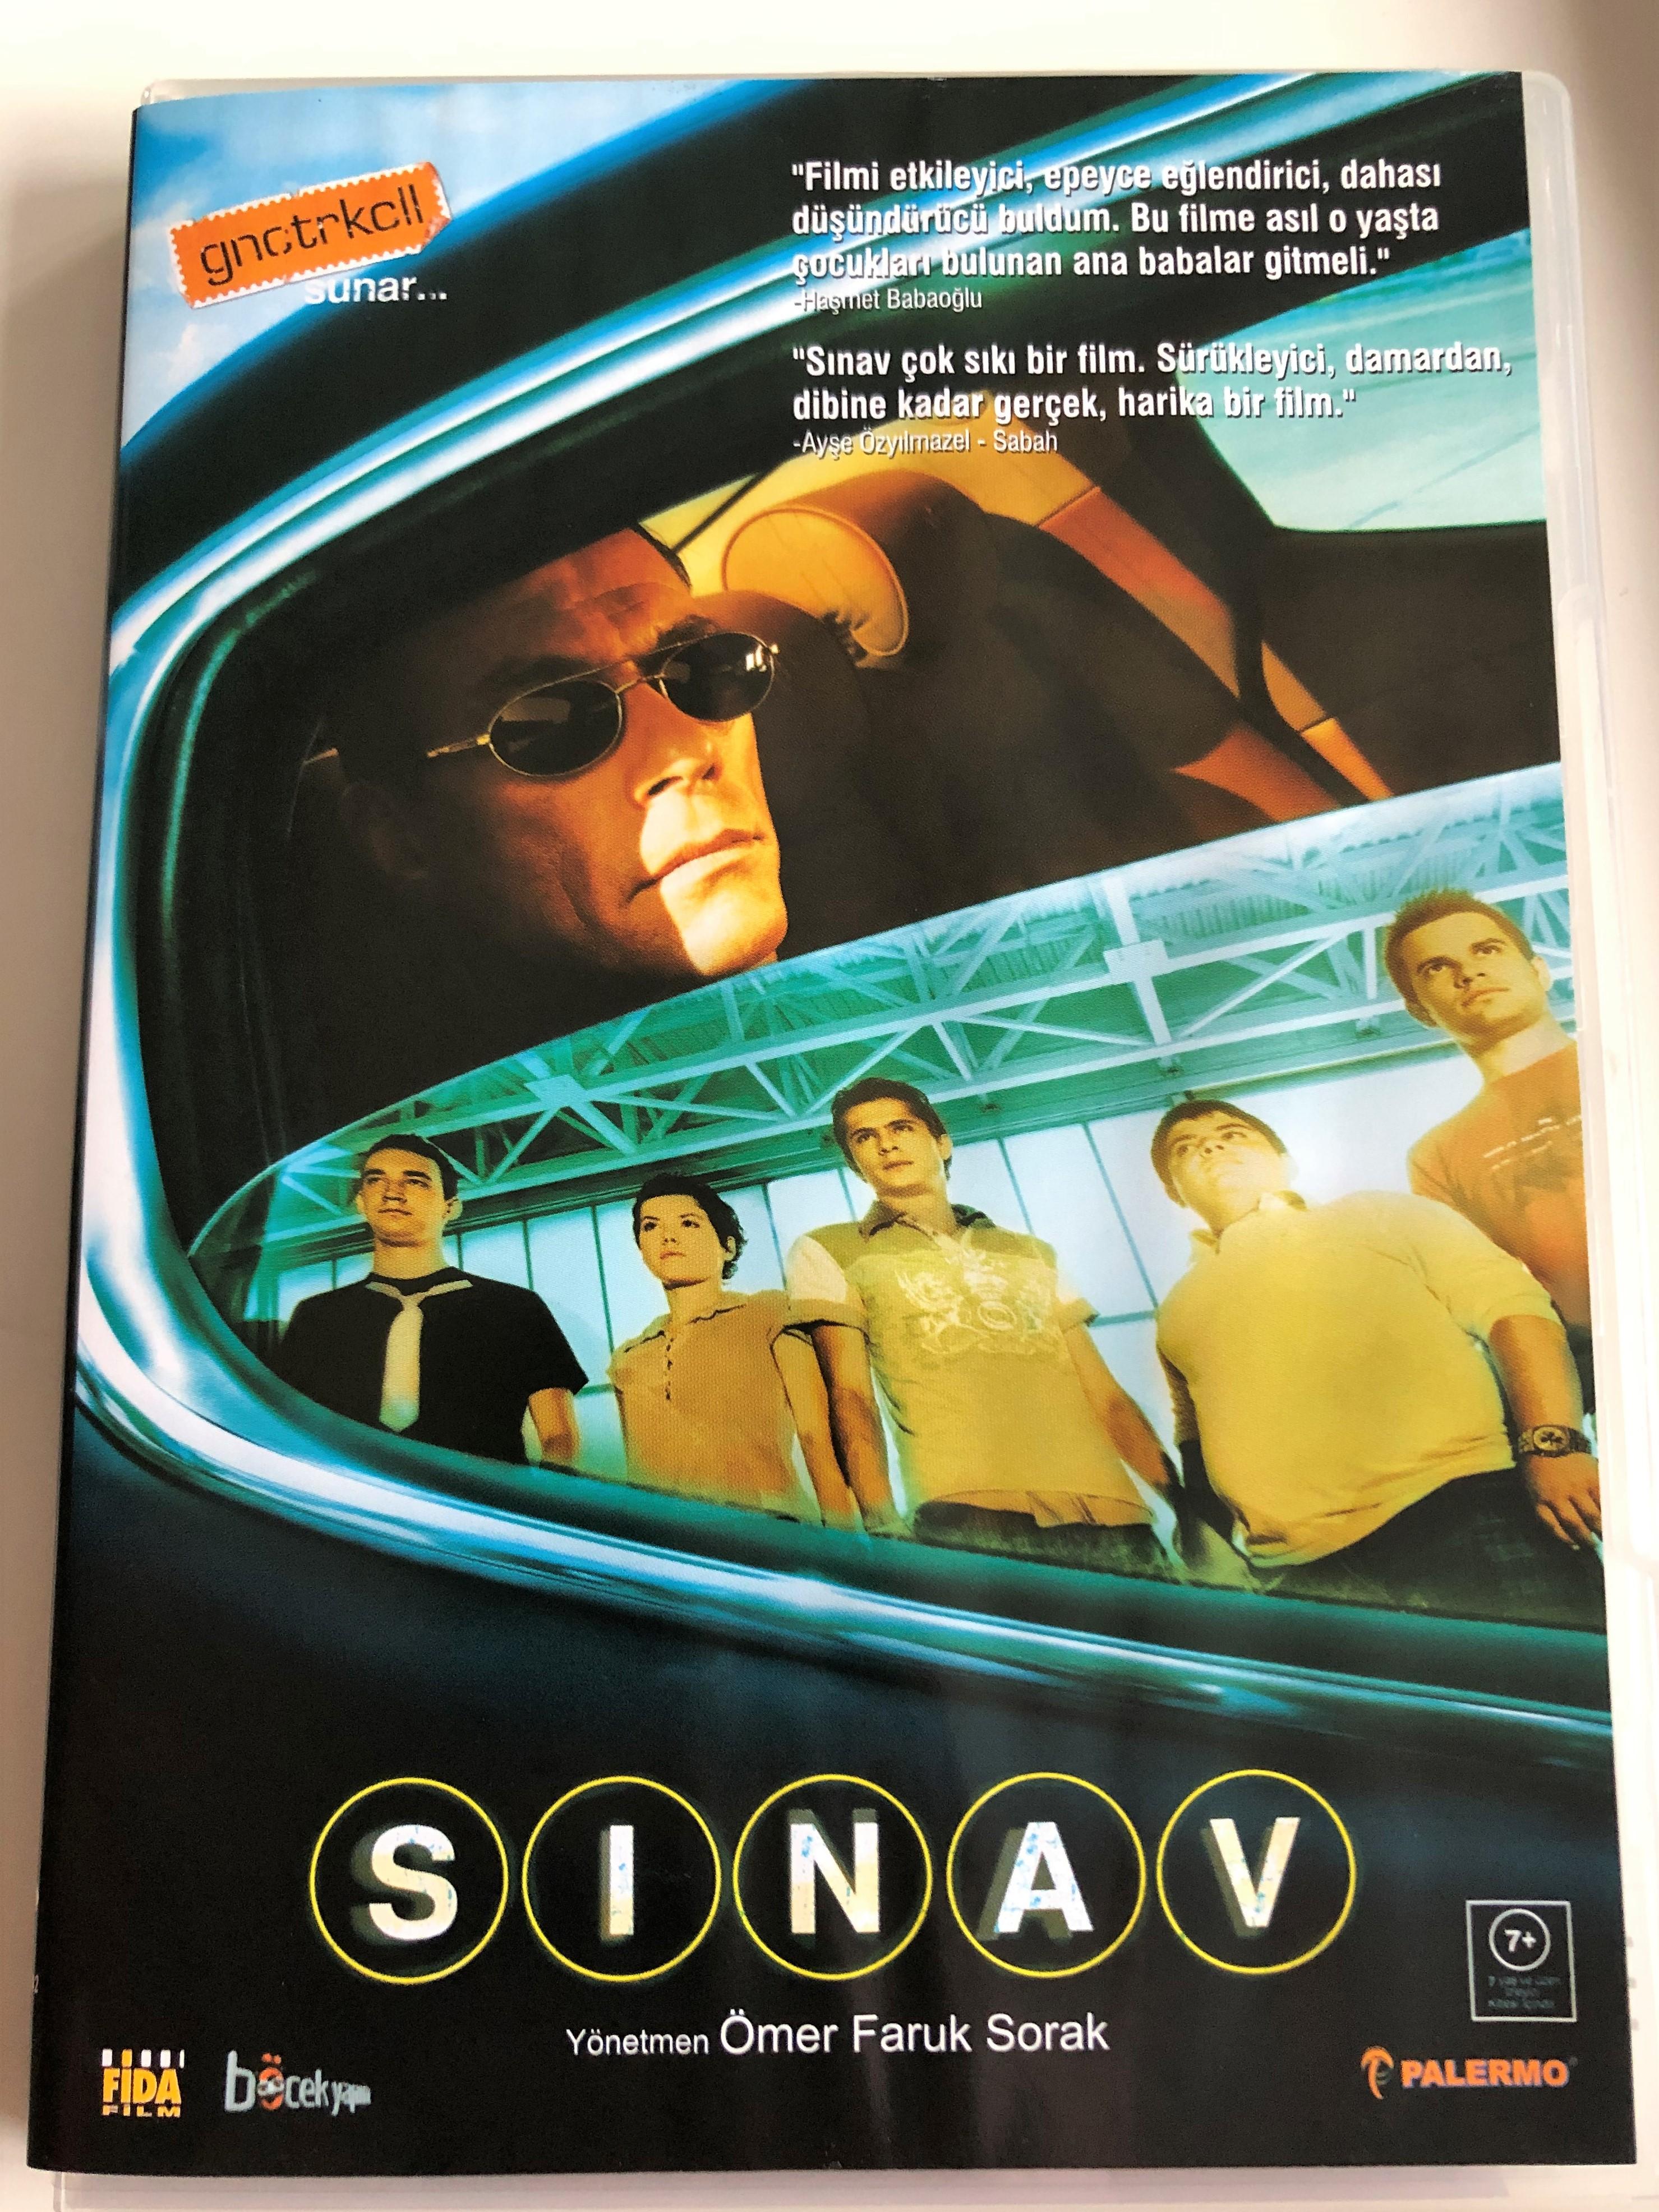 sinav-dvd-2006-heist-school-directed-by-mer-faruk-sorak-starring-jean-claude-van-damme-h-meyra-akbay-altan-erkekli-g-ven-k-ra-zafer-alg-z-1-.jpg